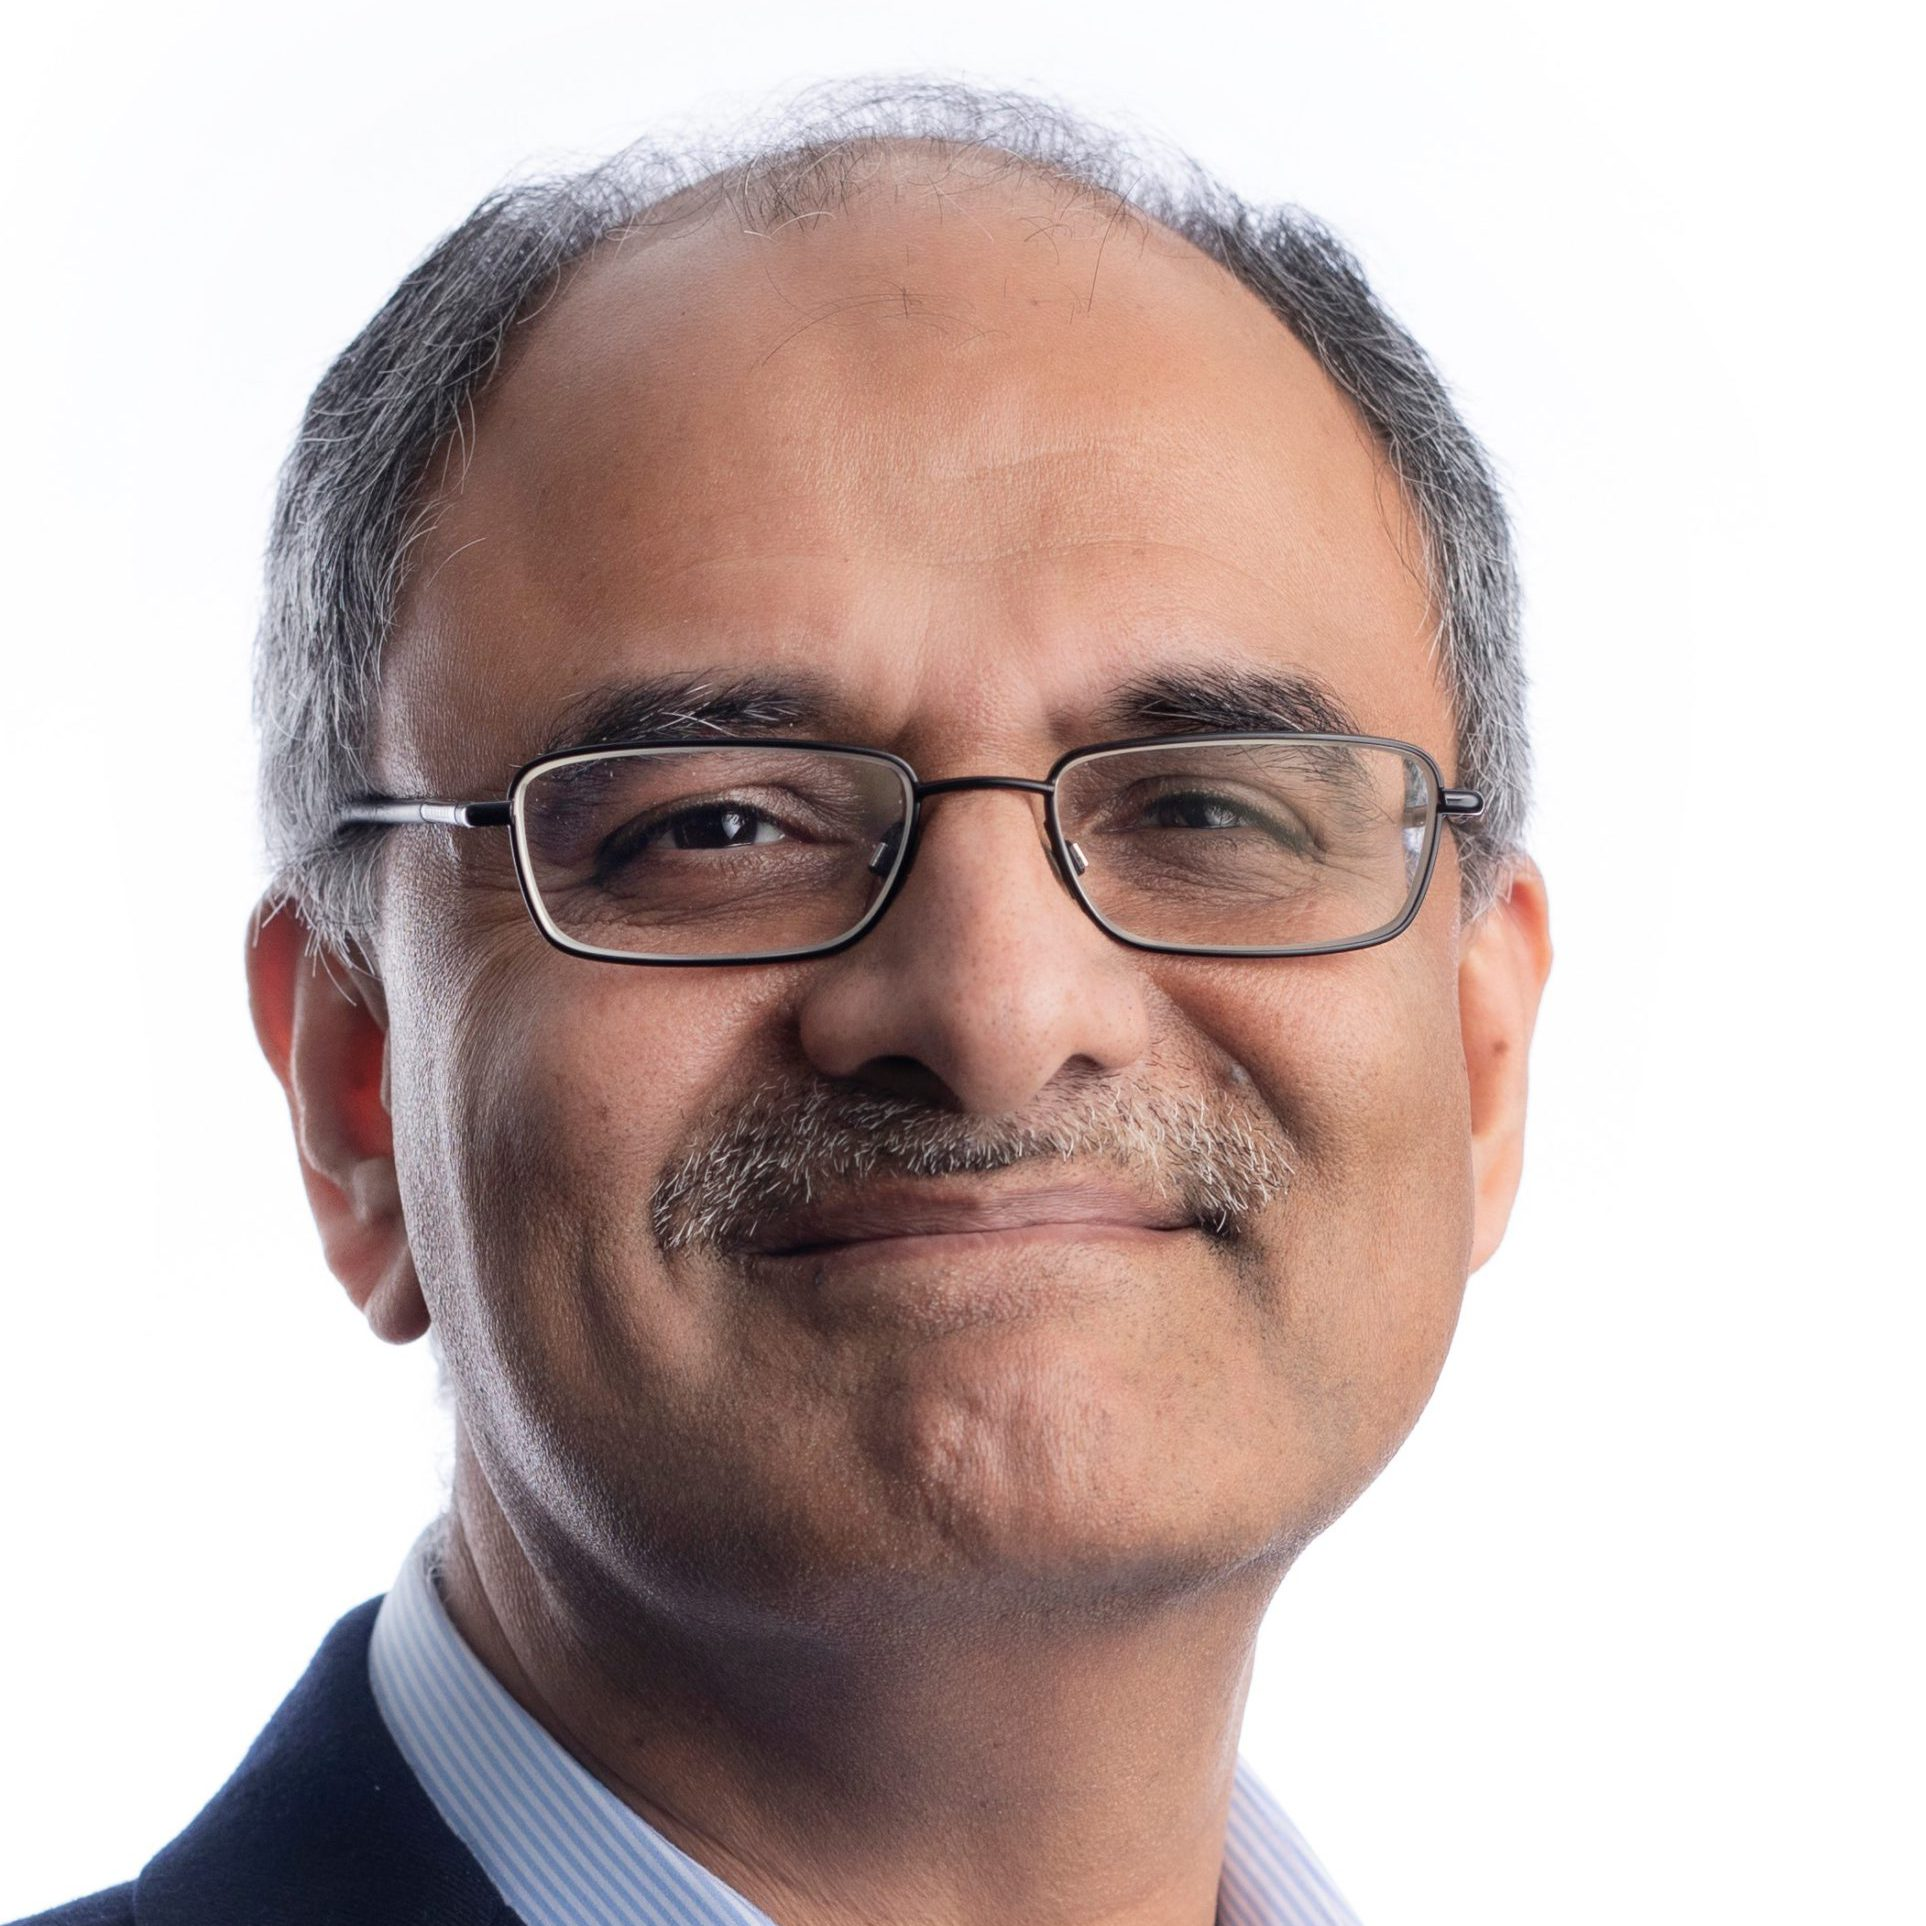 Dr. Shurjeel Choudhri